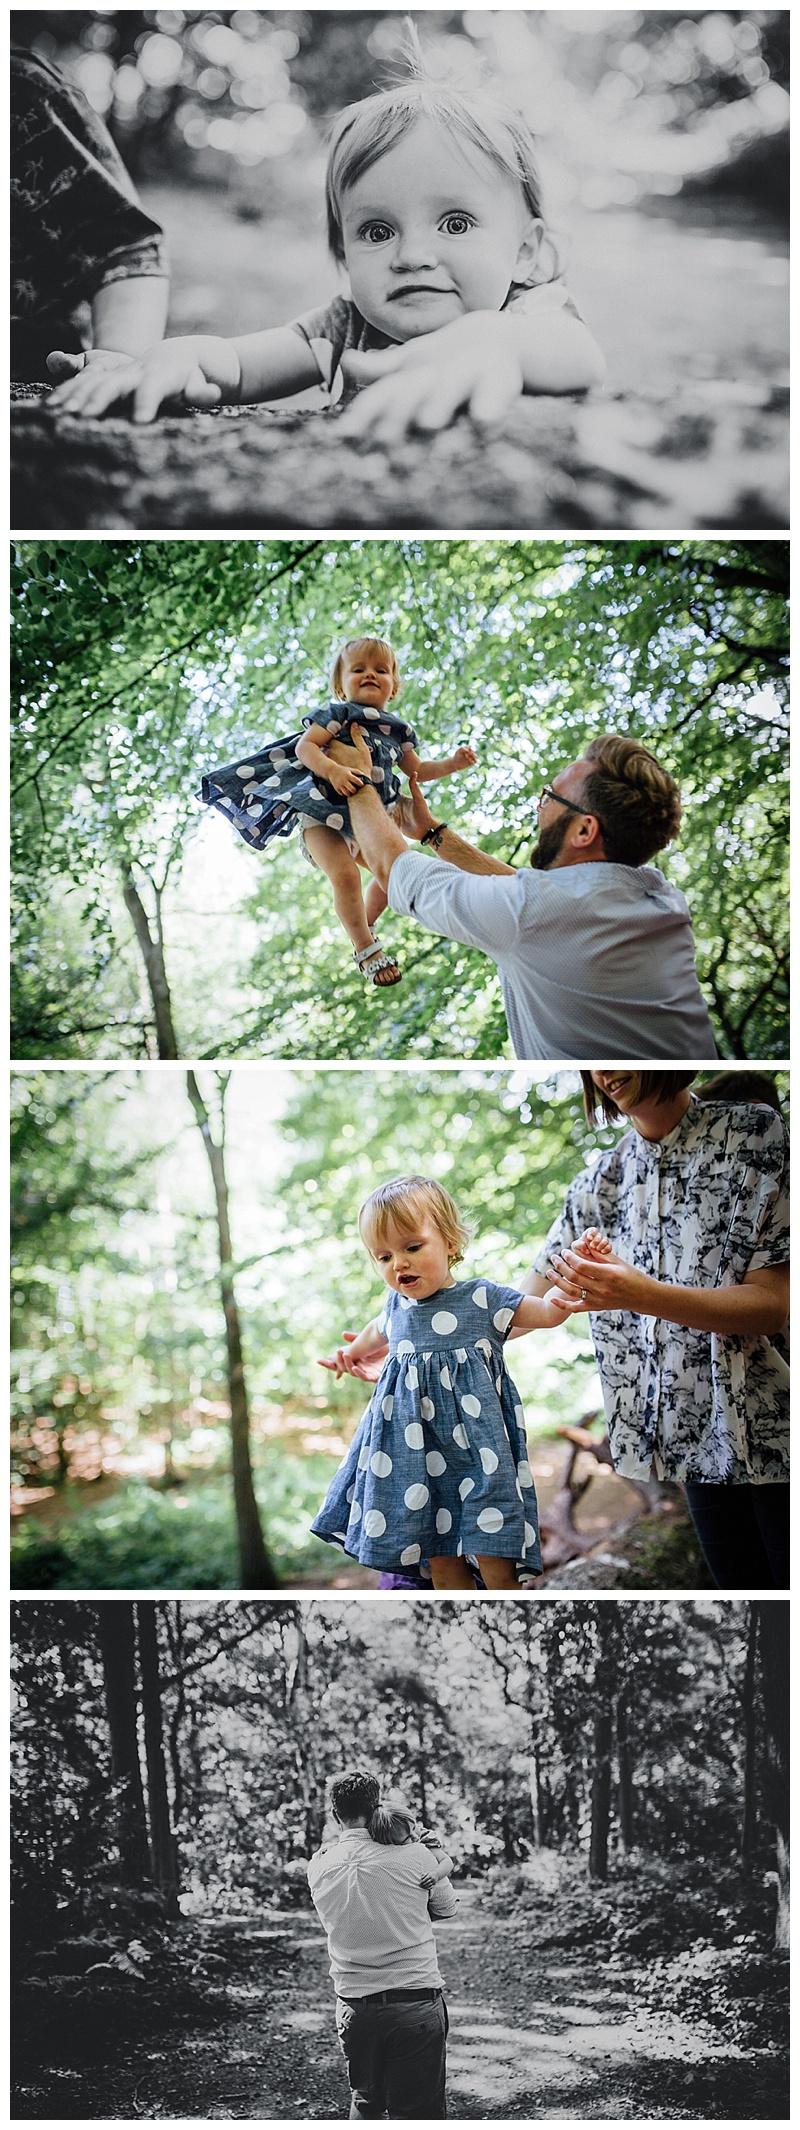 2015-09-11_0005.jpgWest Midlands Childrens Photographer | Angelfire Photography | www.angelfirephotography.co.uk 2